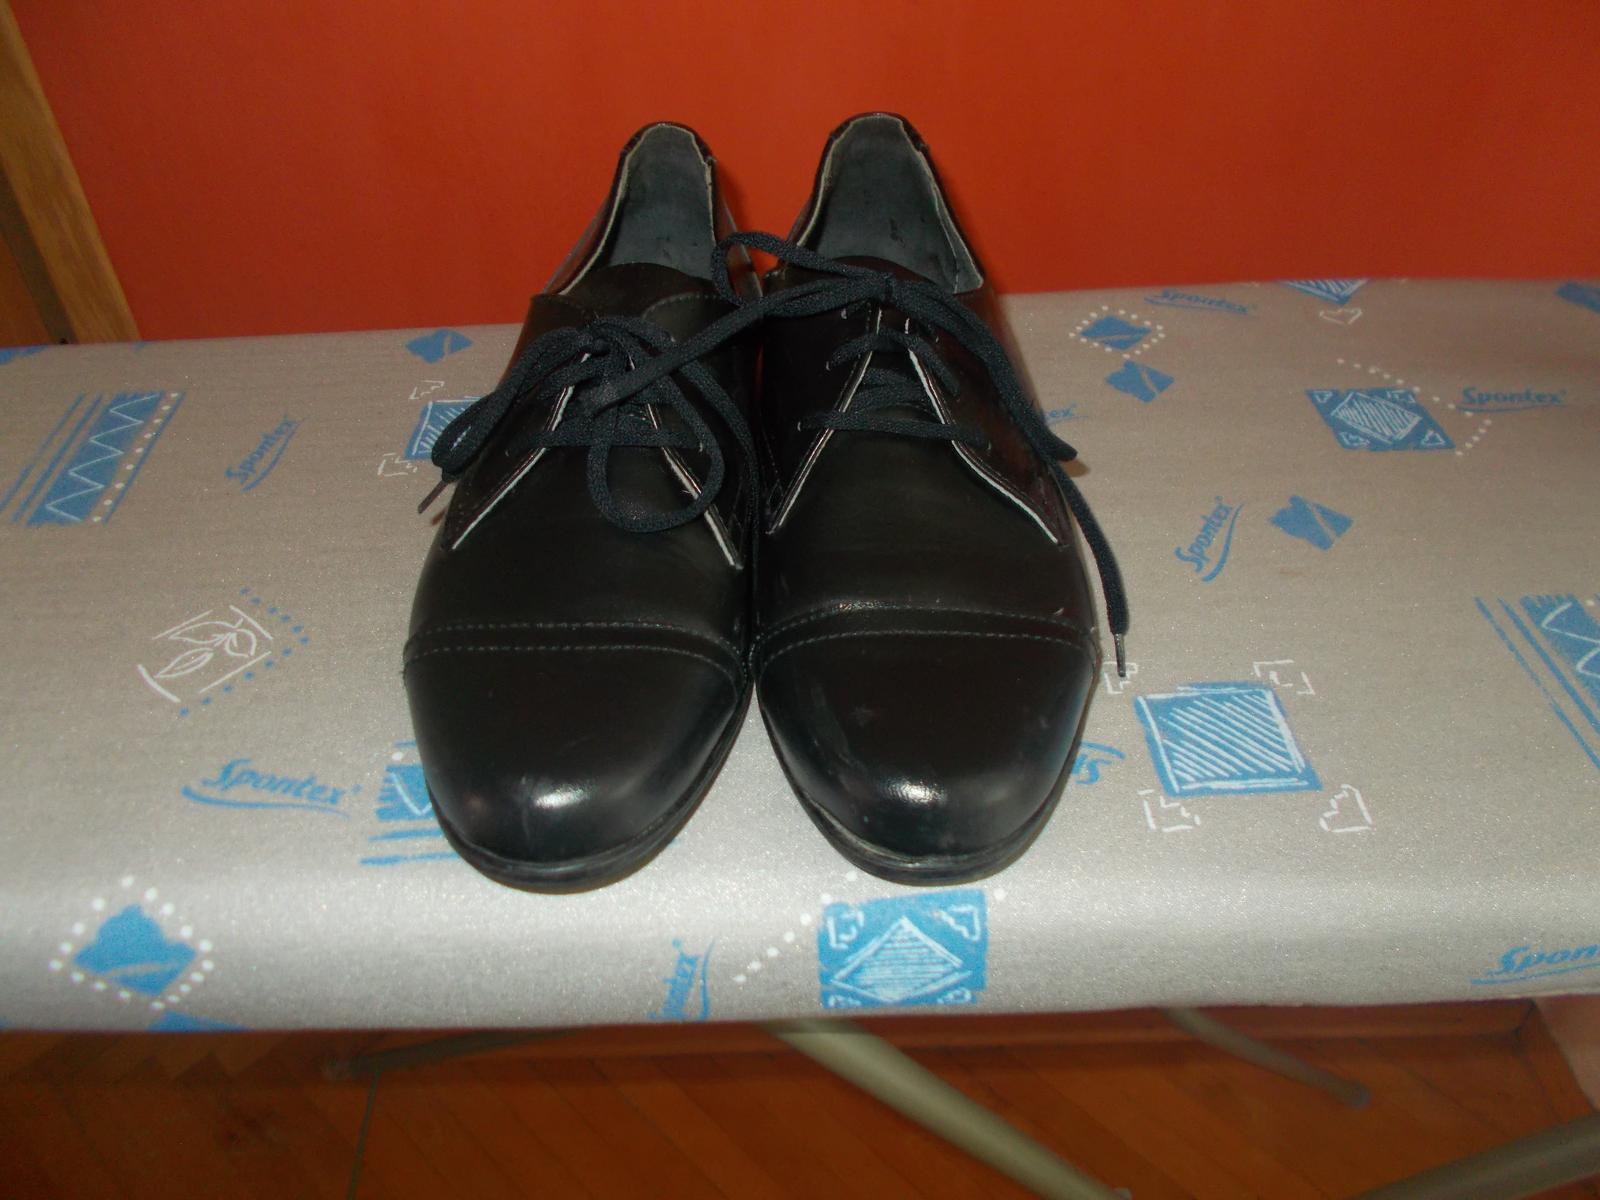 7a8019fc11 Pánske chlapčenské spoločenské topánky